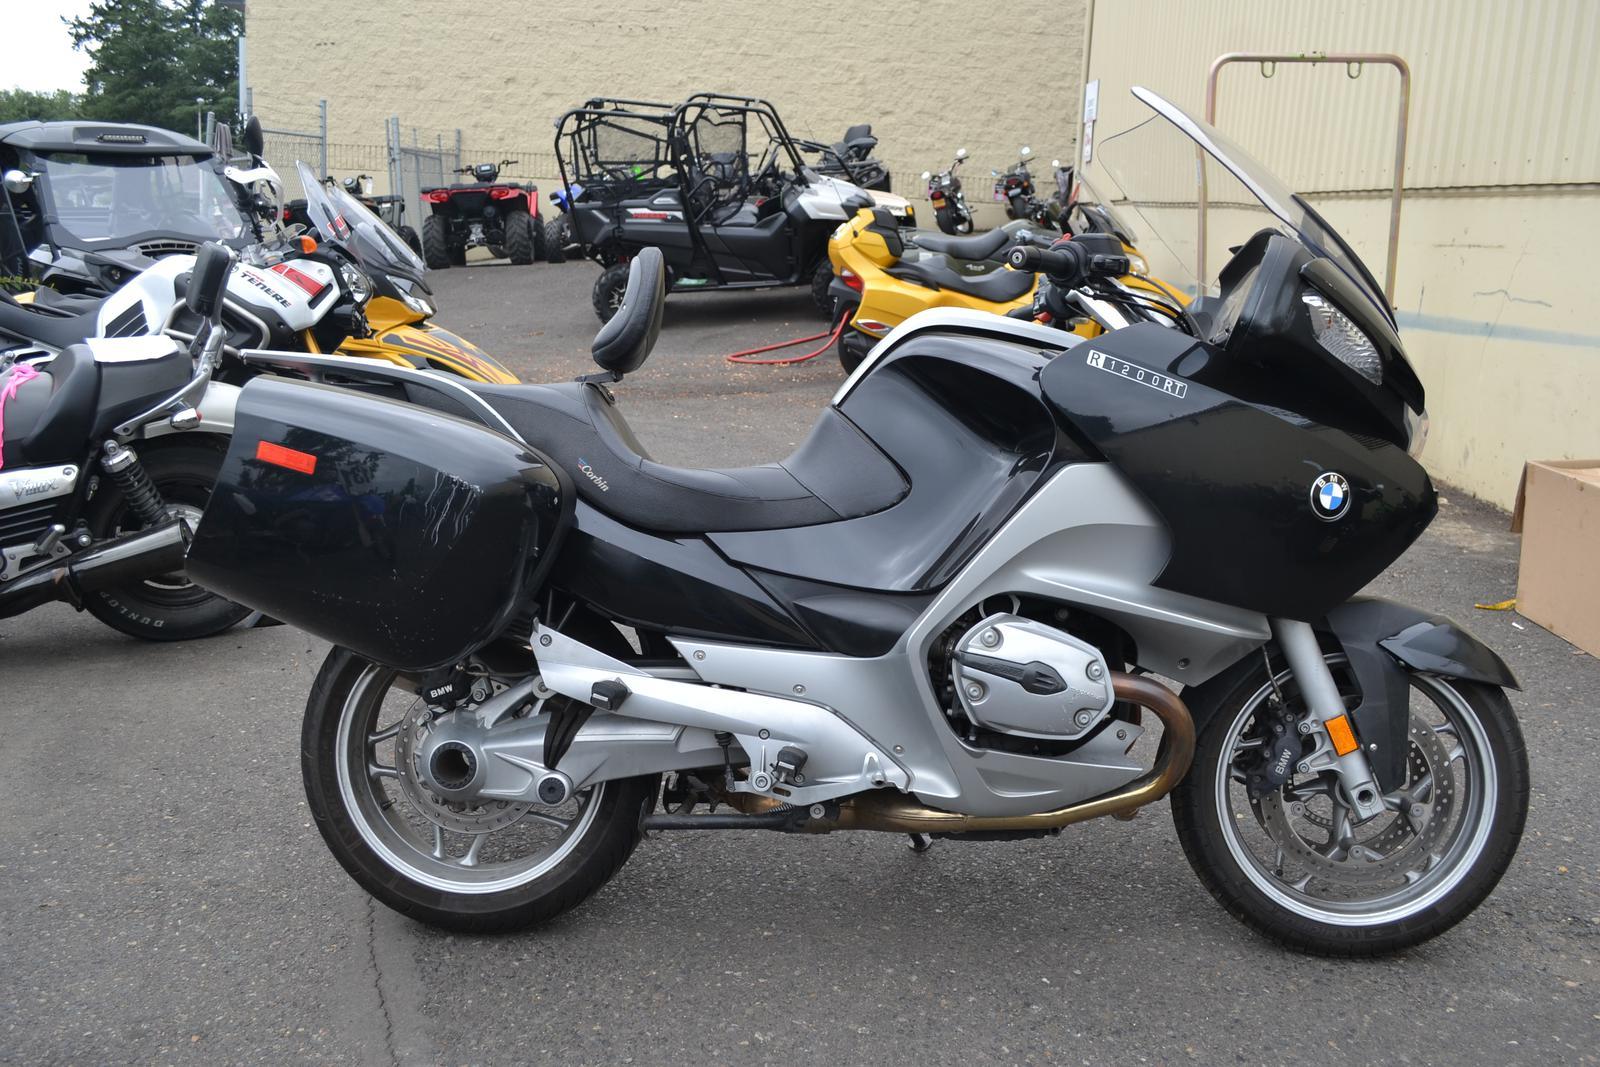 3 Wheel Motorcycle and Street Bikes from Yamaha, Husqvarna